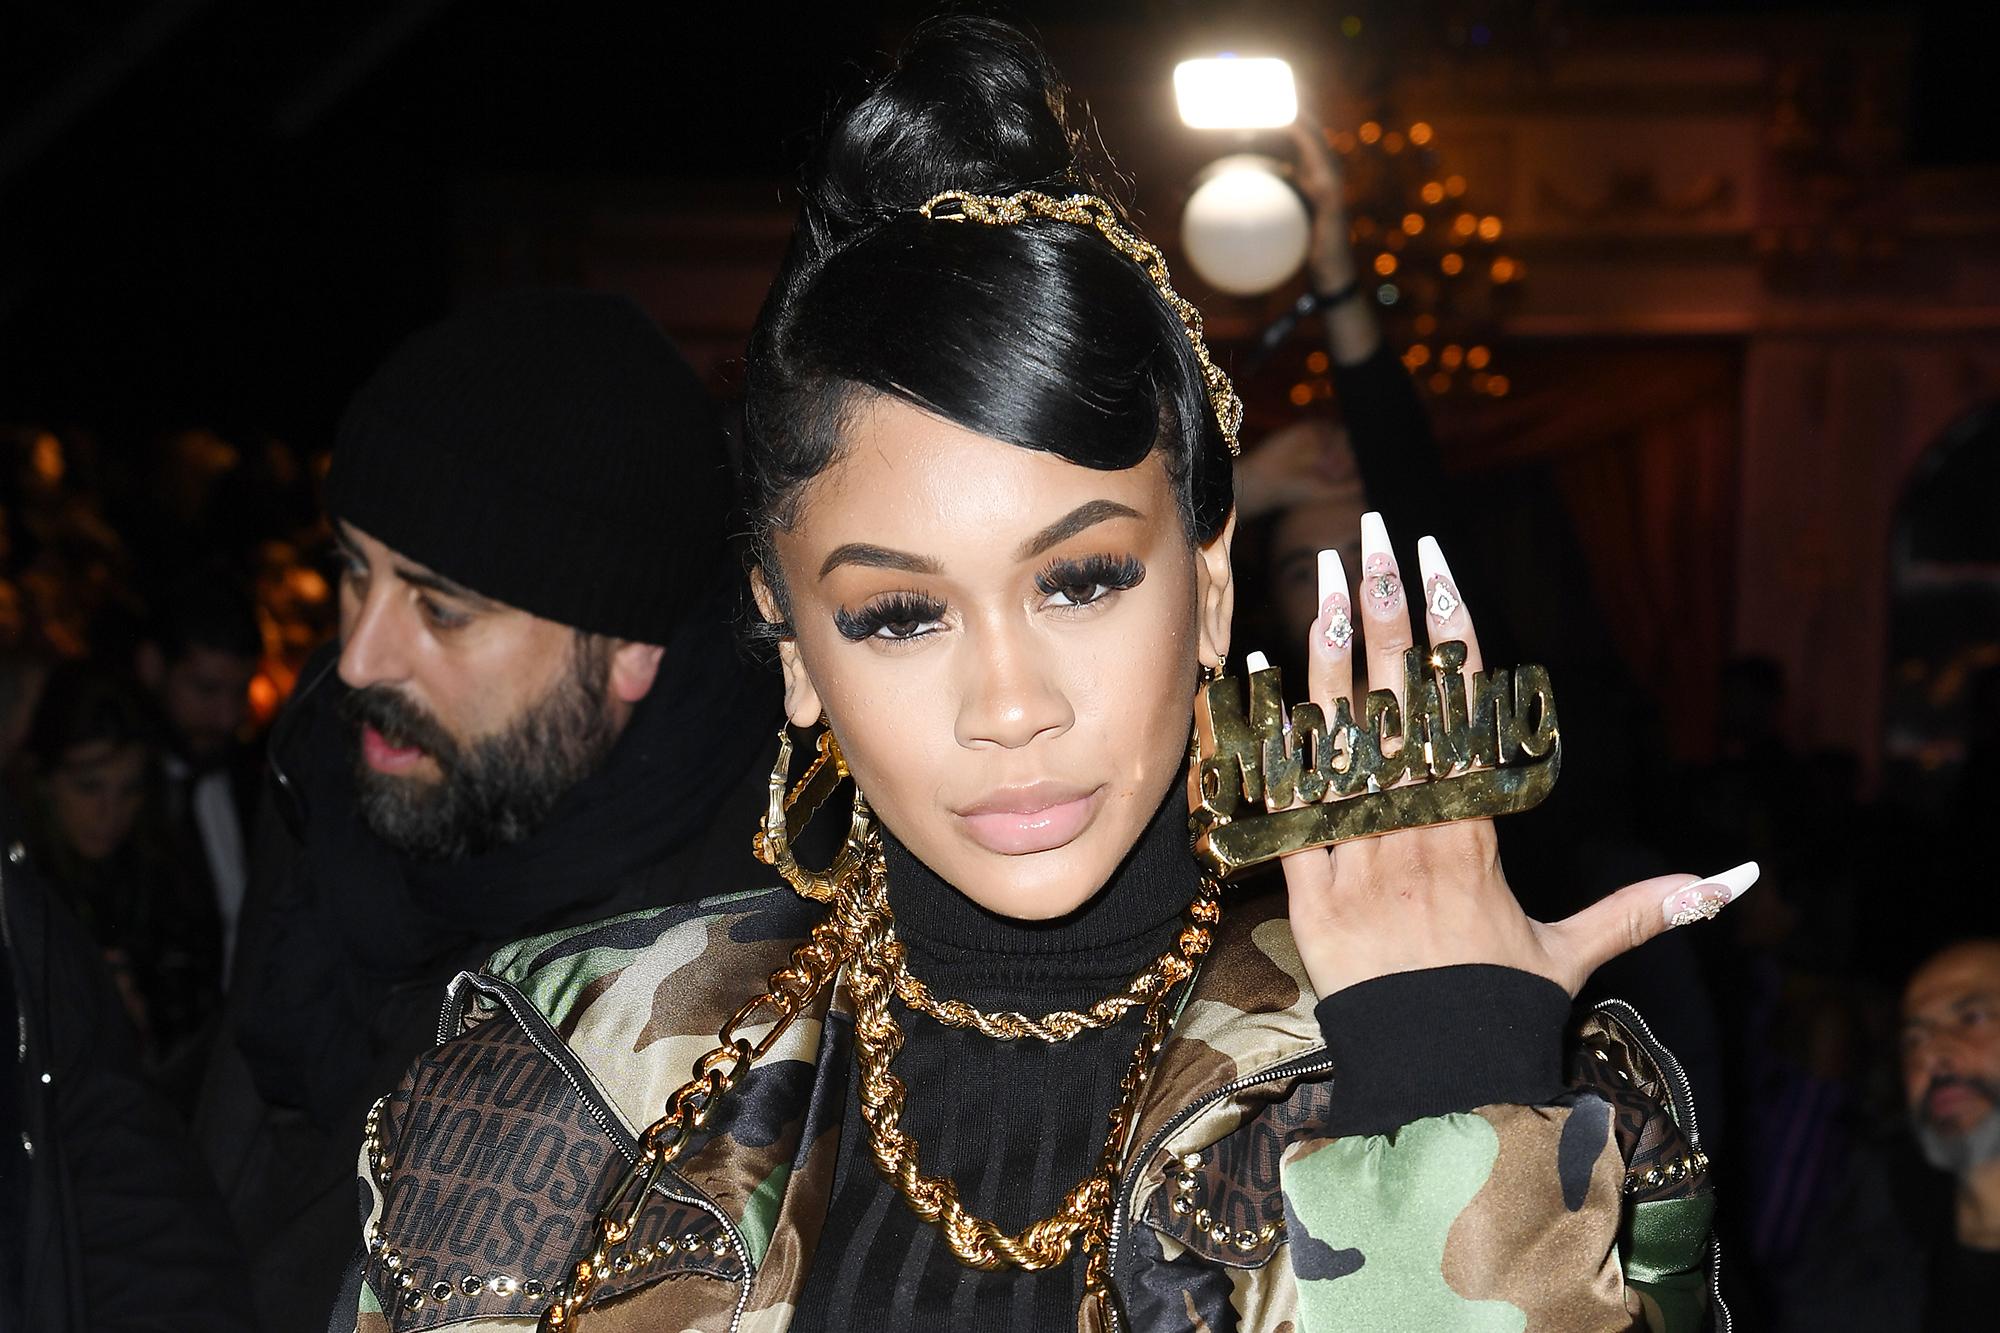 Rapper Saweetie says all men should buy their women Birkins